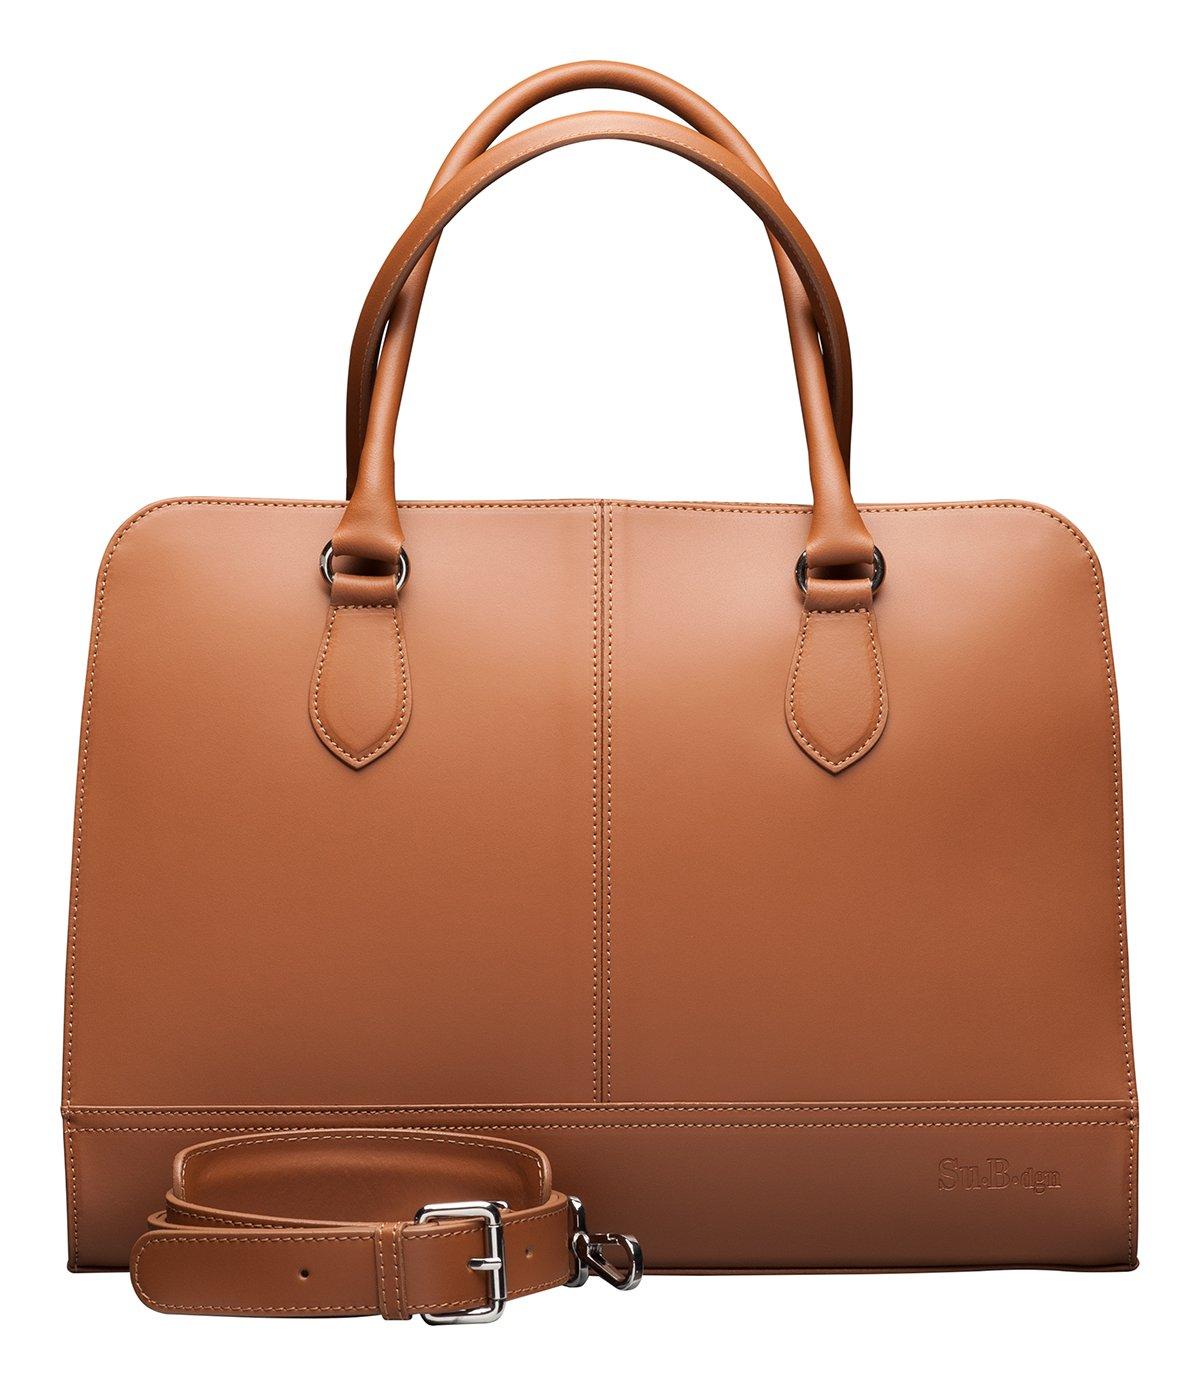 Su.B.dgn Designer 15.6 Inch Laptop Handbag Messenger Bag for Women | Genuine Italian Leather | Professional, Vertical Shoulder Tote | Computer, PC, Notebook, MacBook | Brown